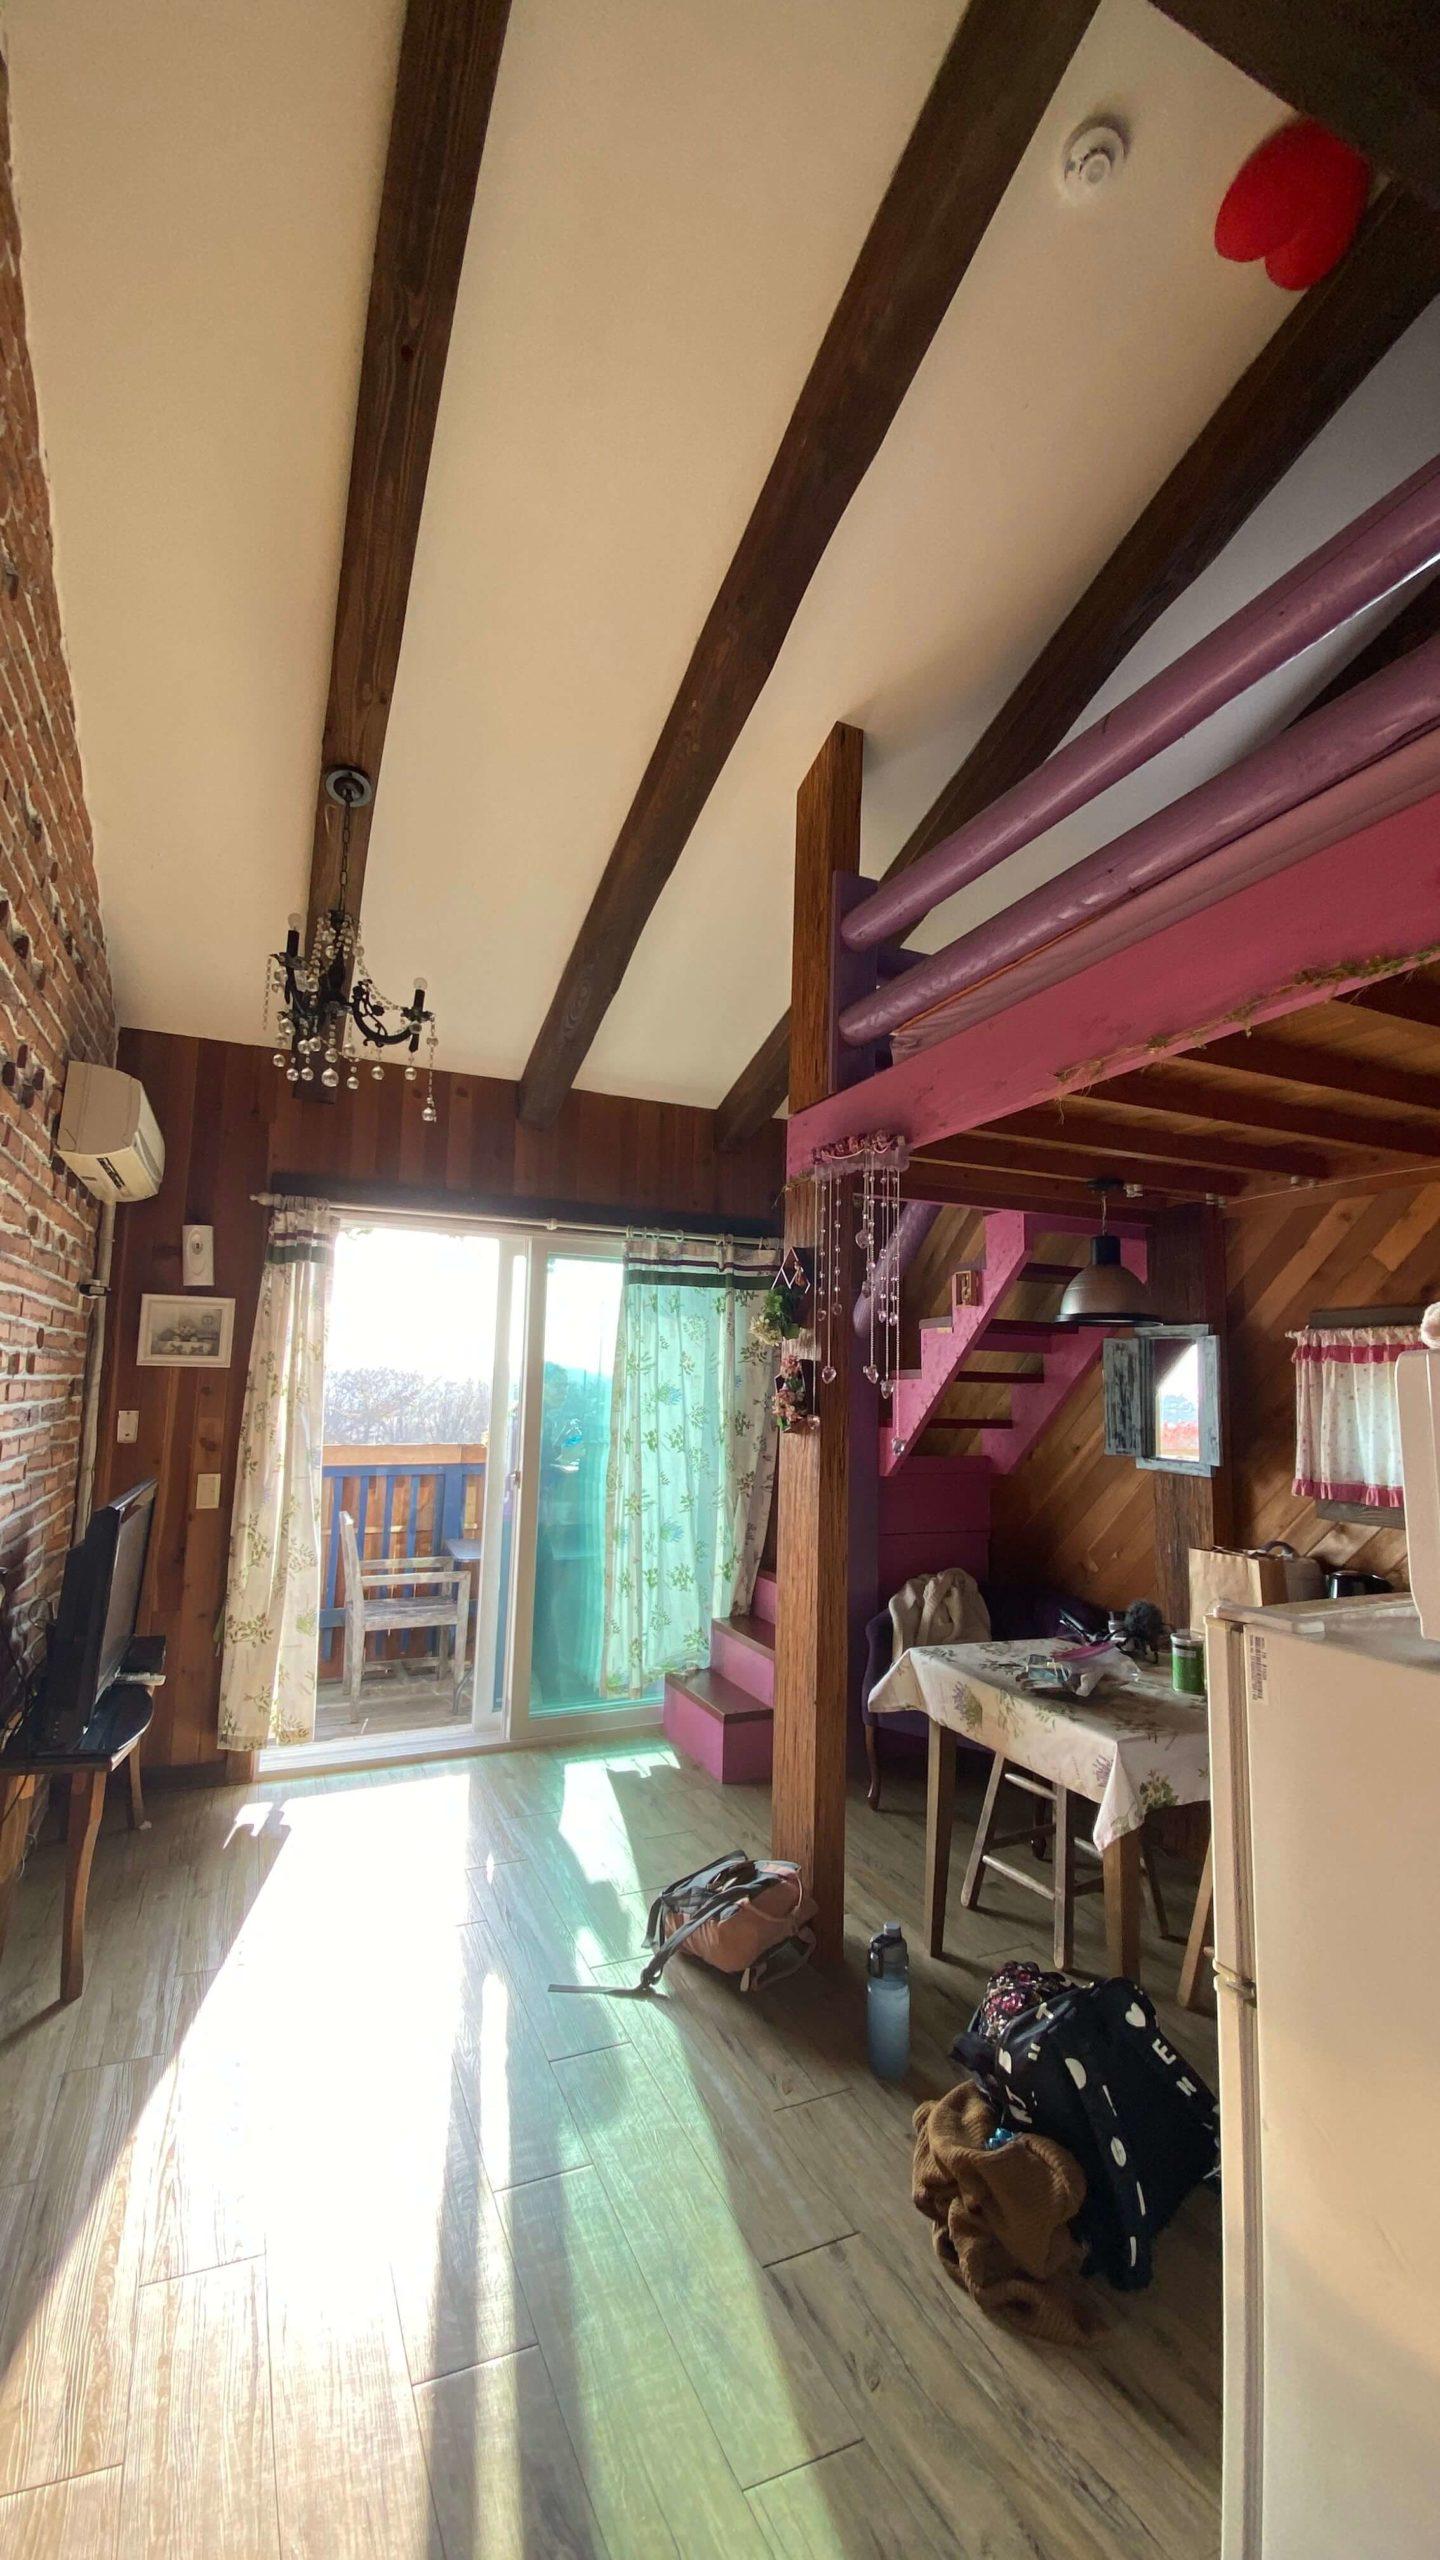 Tea Tree Room at Farm Kamille in TaeAn south Korea